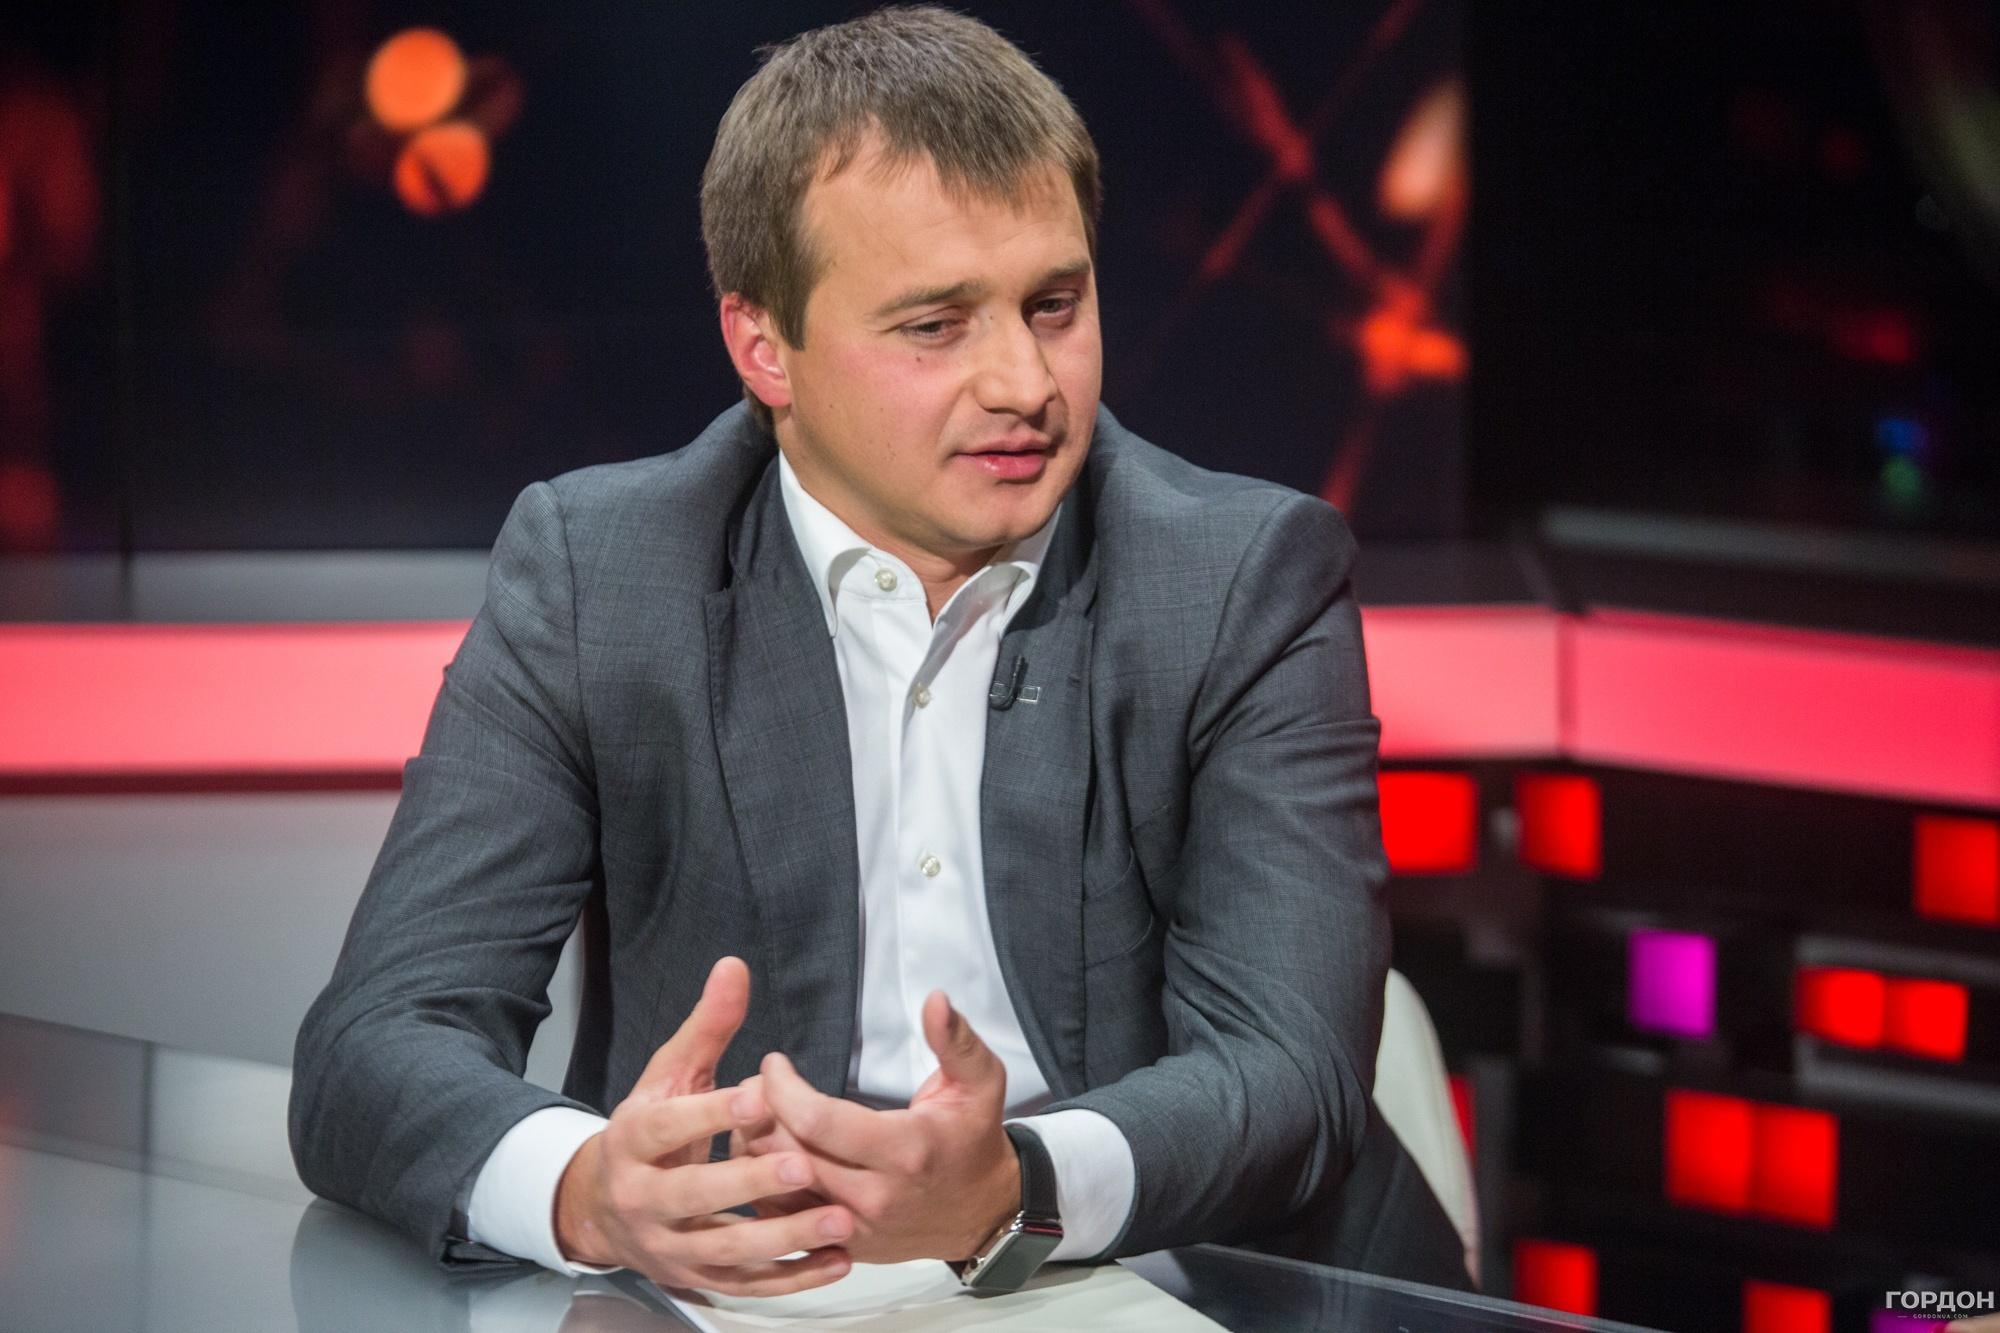 Фото: Александр Хоменко / Gordonua.com